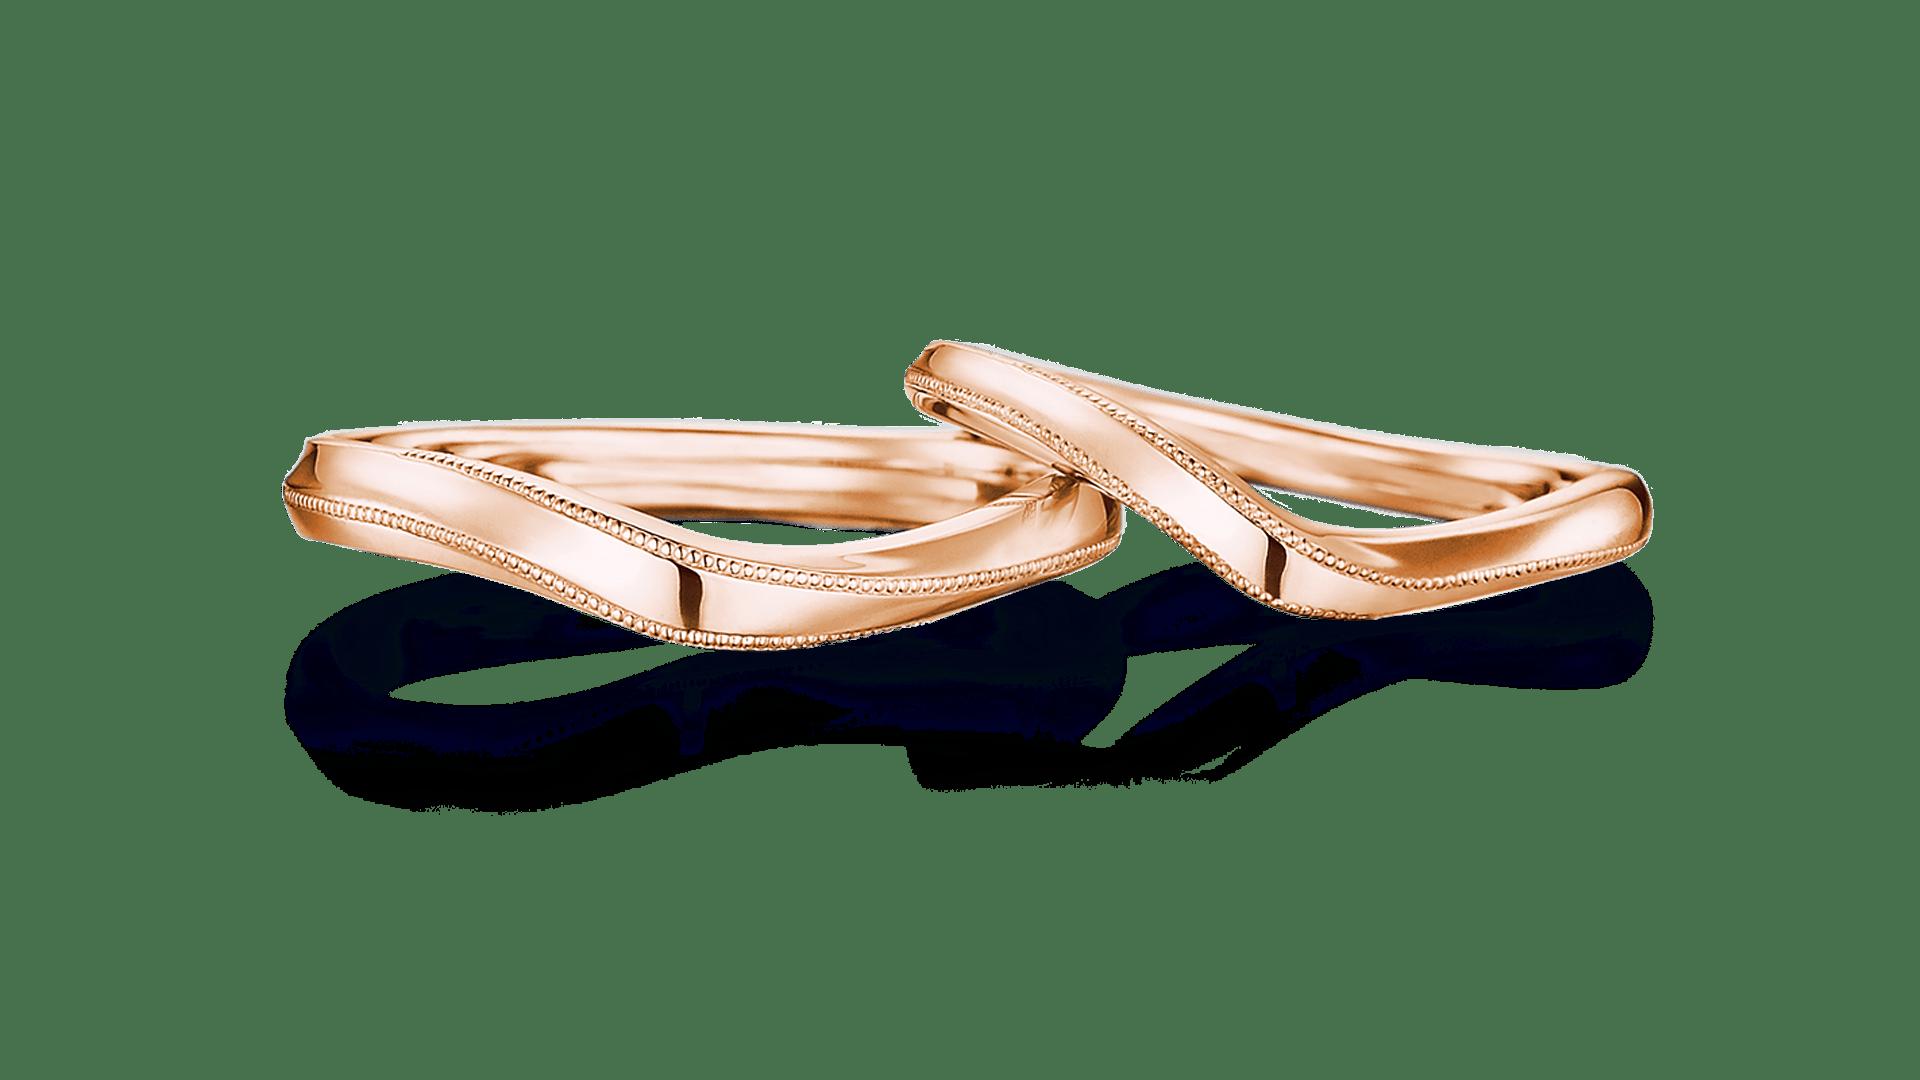 apias plain アピアス プレーン | 結婚指輪サムネイル 1